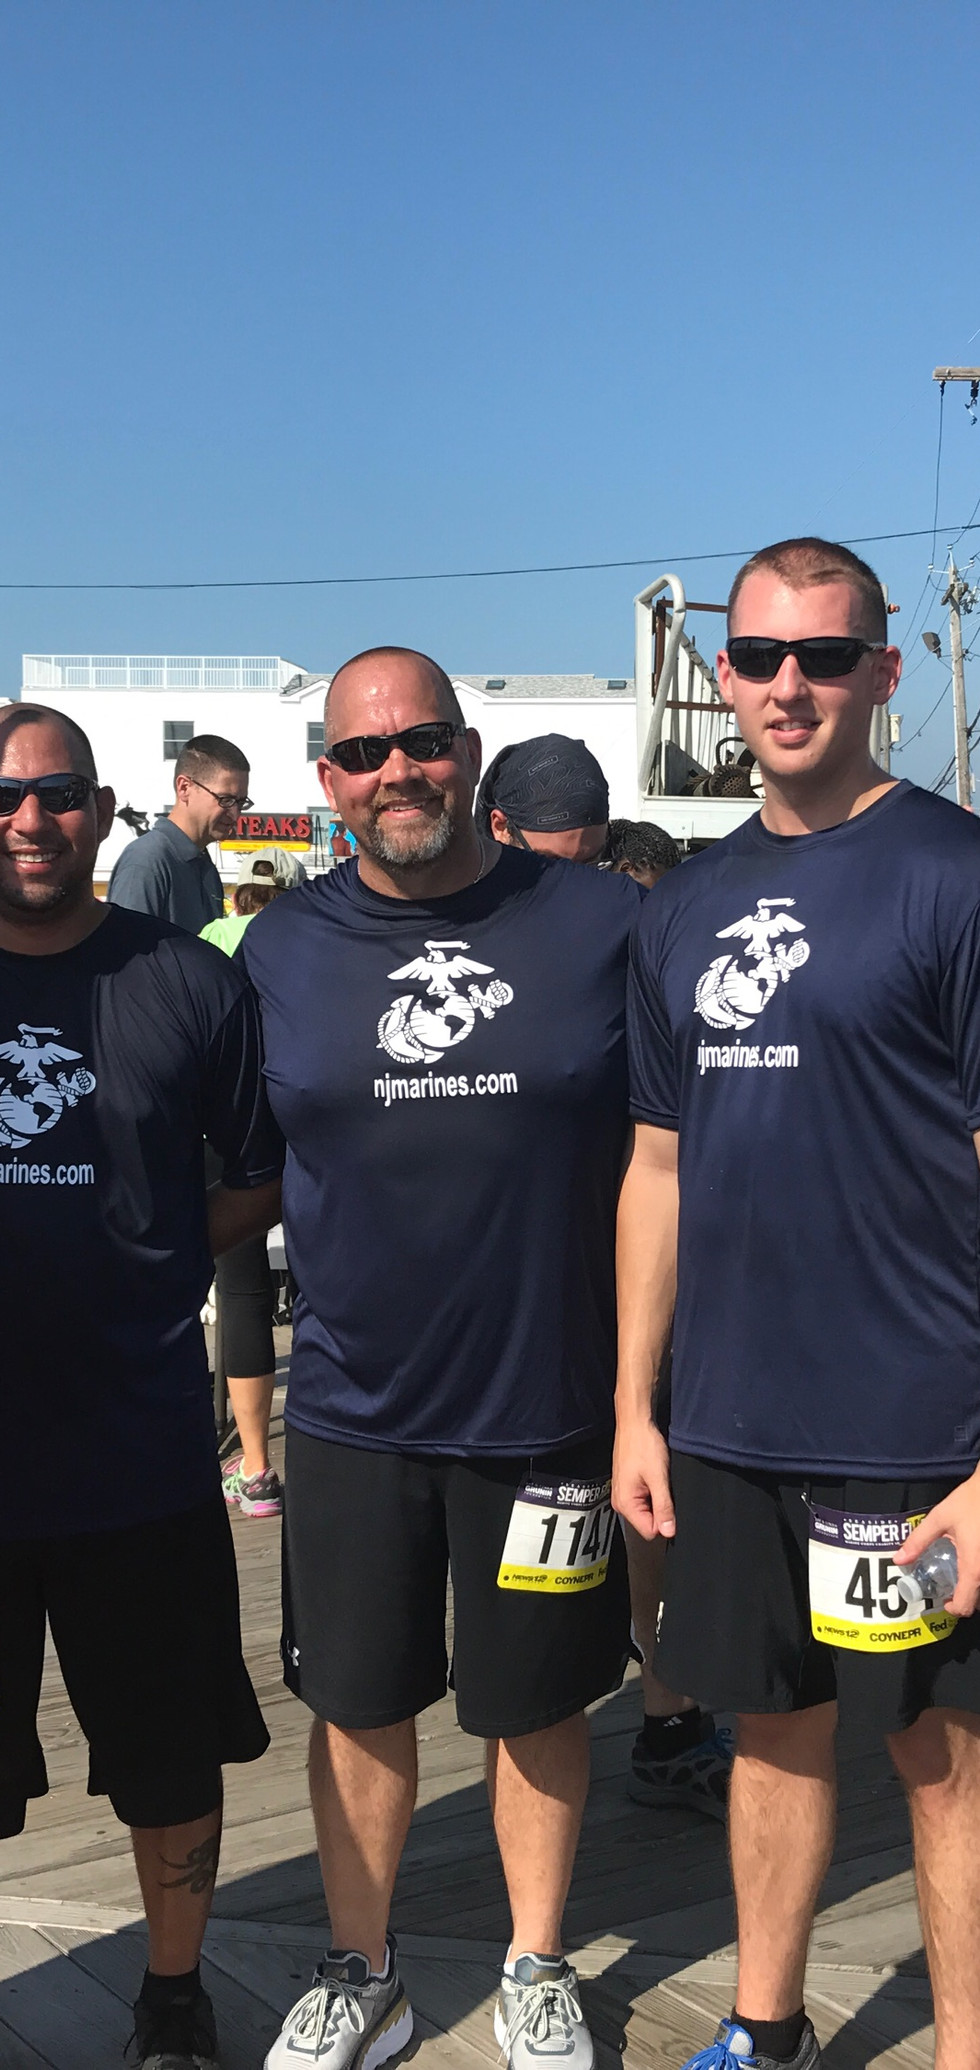 Reynolds runners at 2017 Semper 5